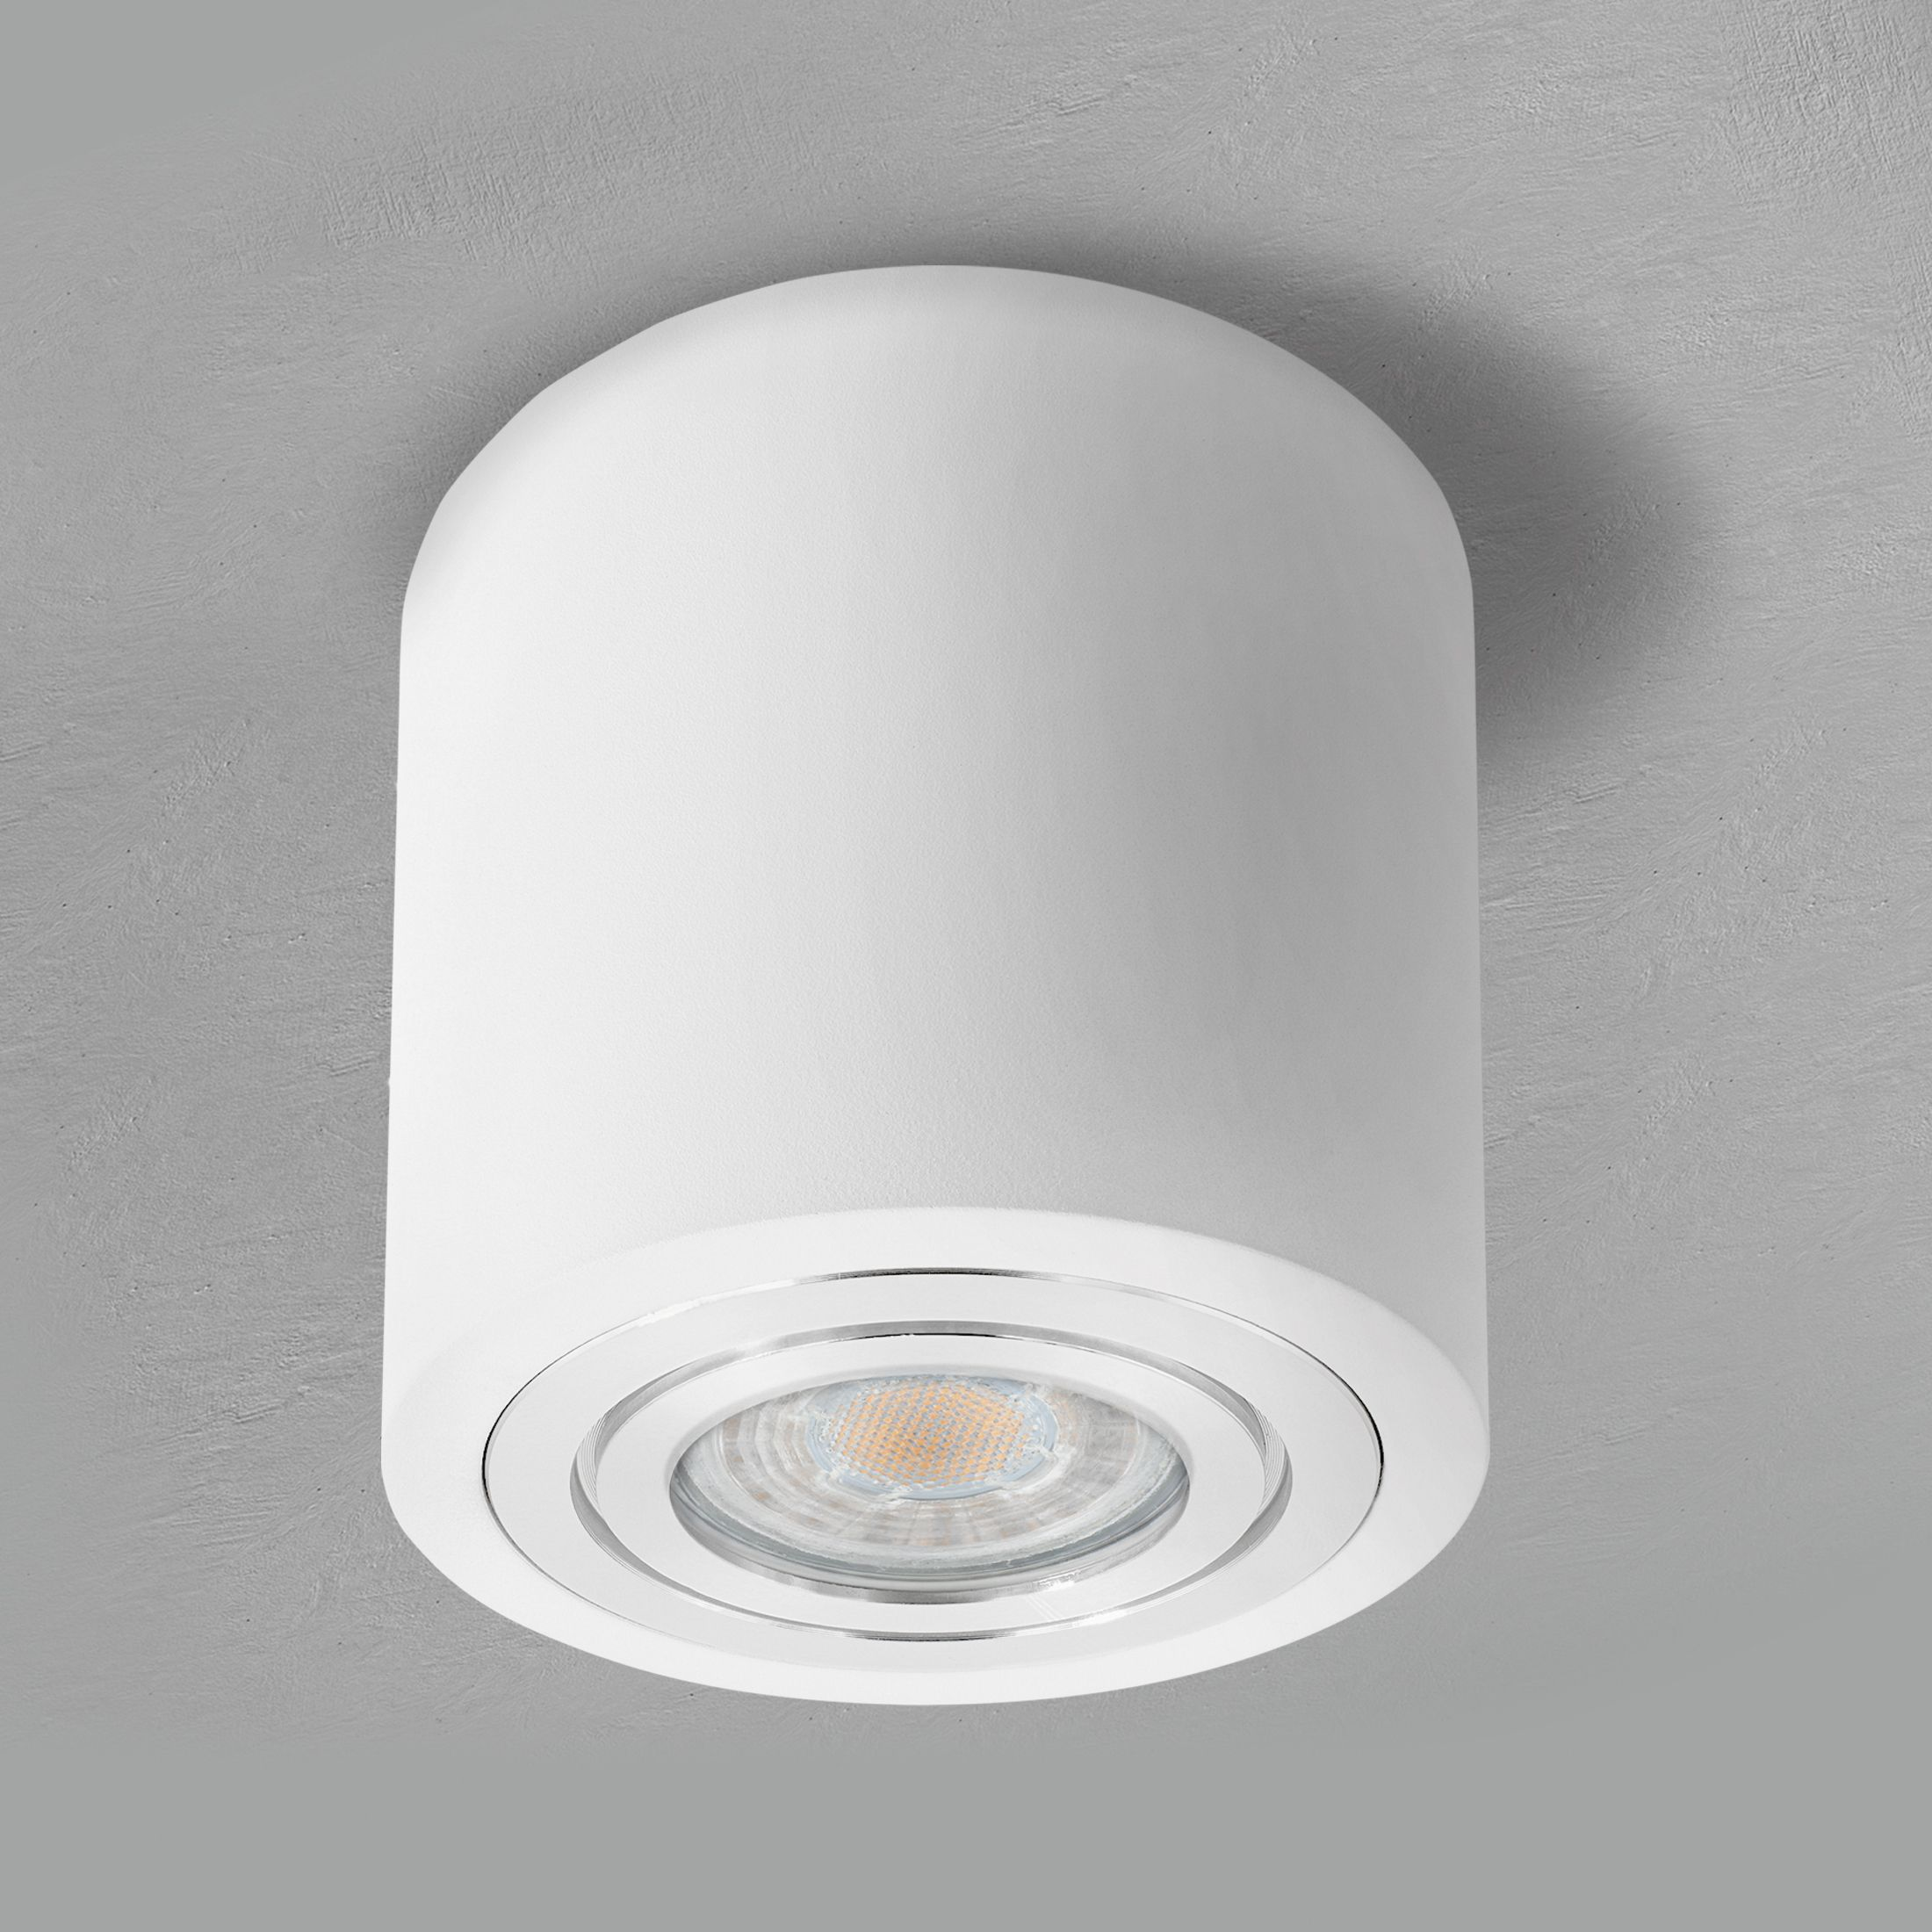 Lampen Badezimmer Decke